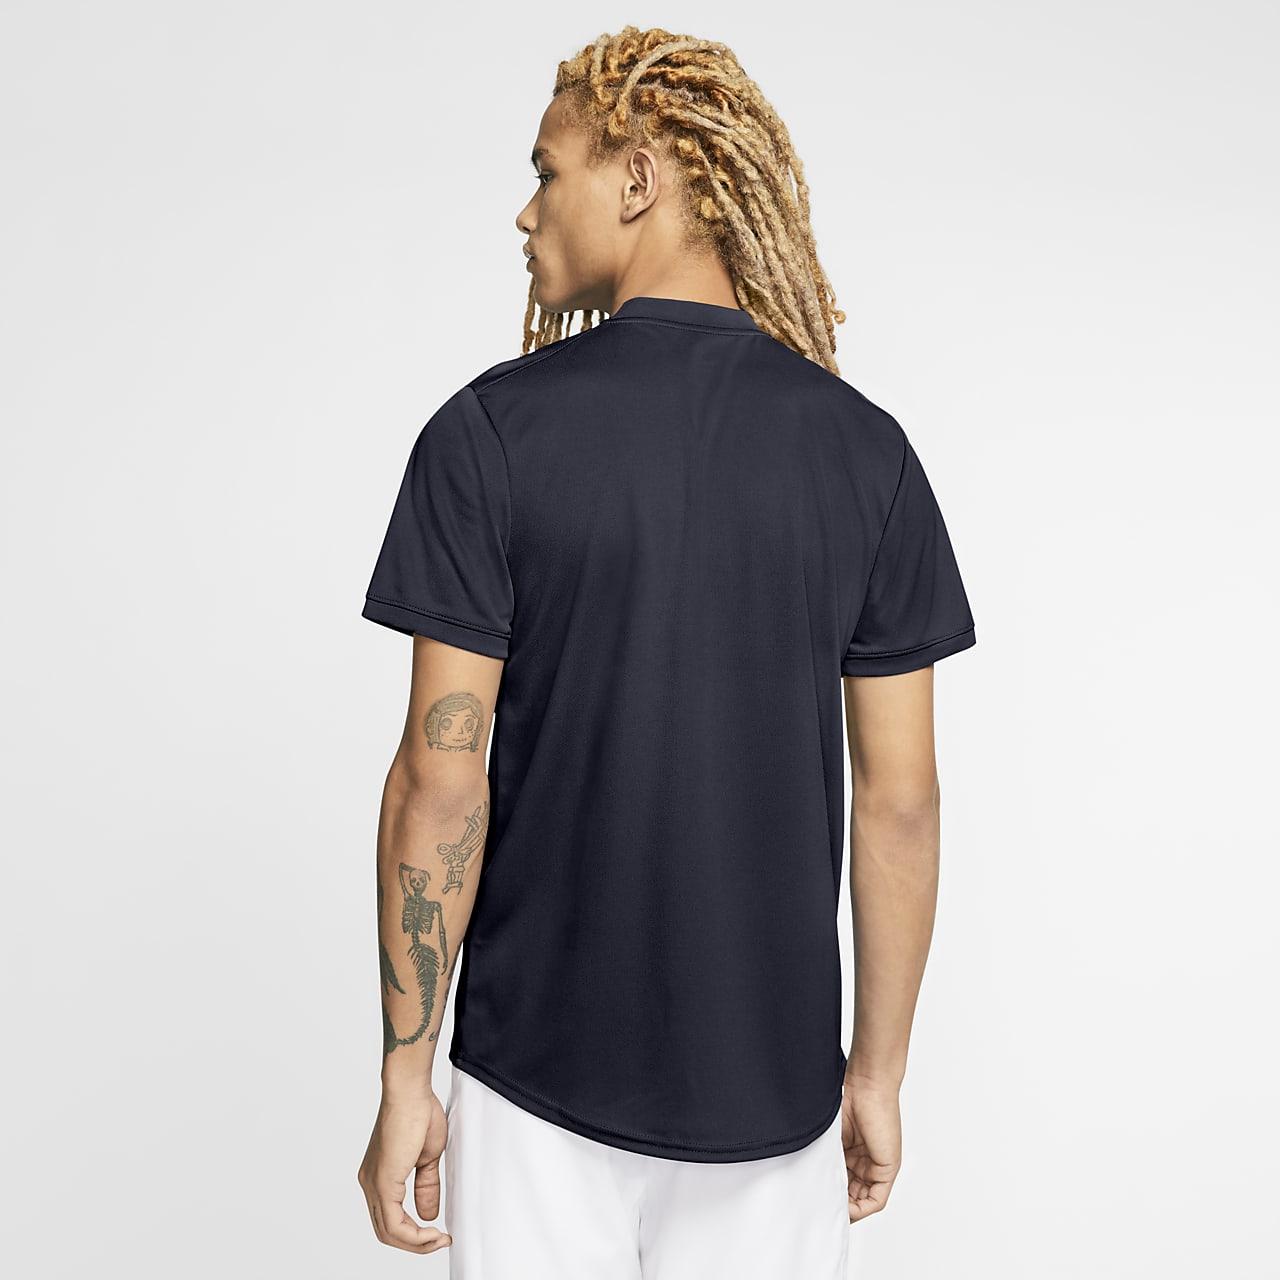 f35f0e31dc7b5 NikeCourt Dri-FIT Herren-Tennis-Poloshirt. Nike.com BE